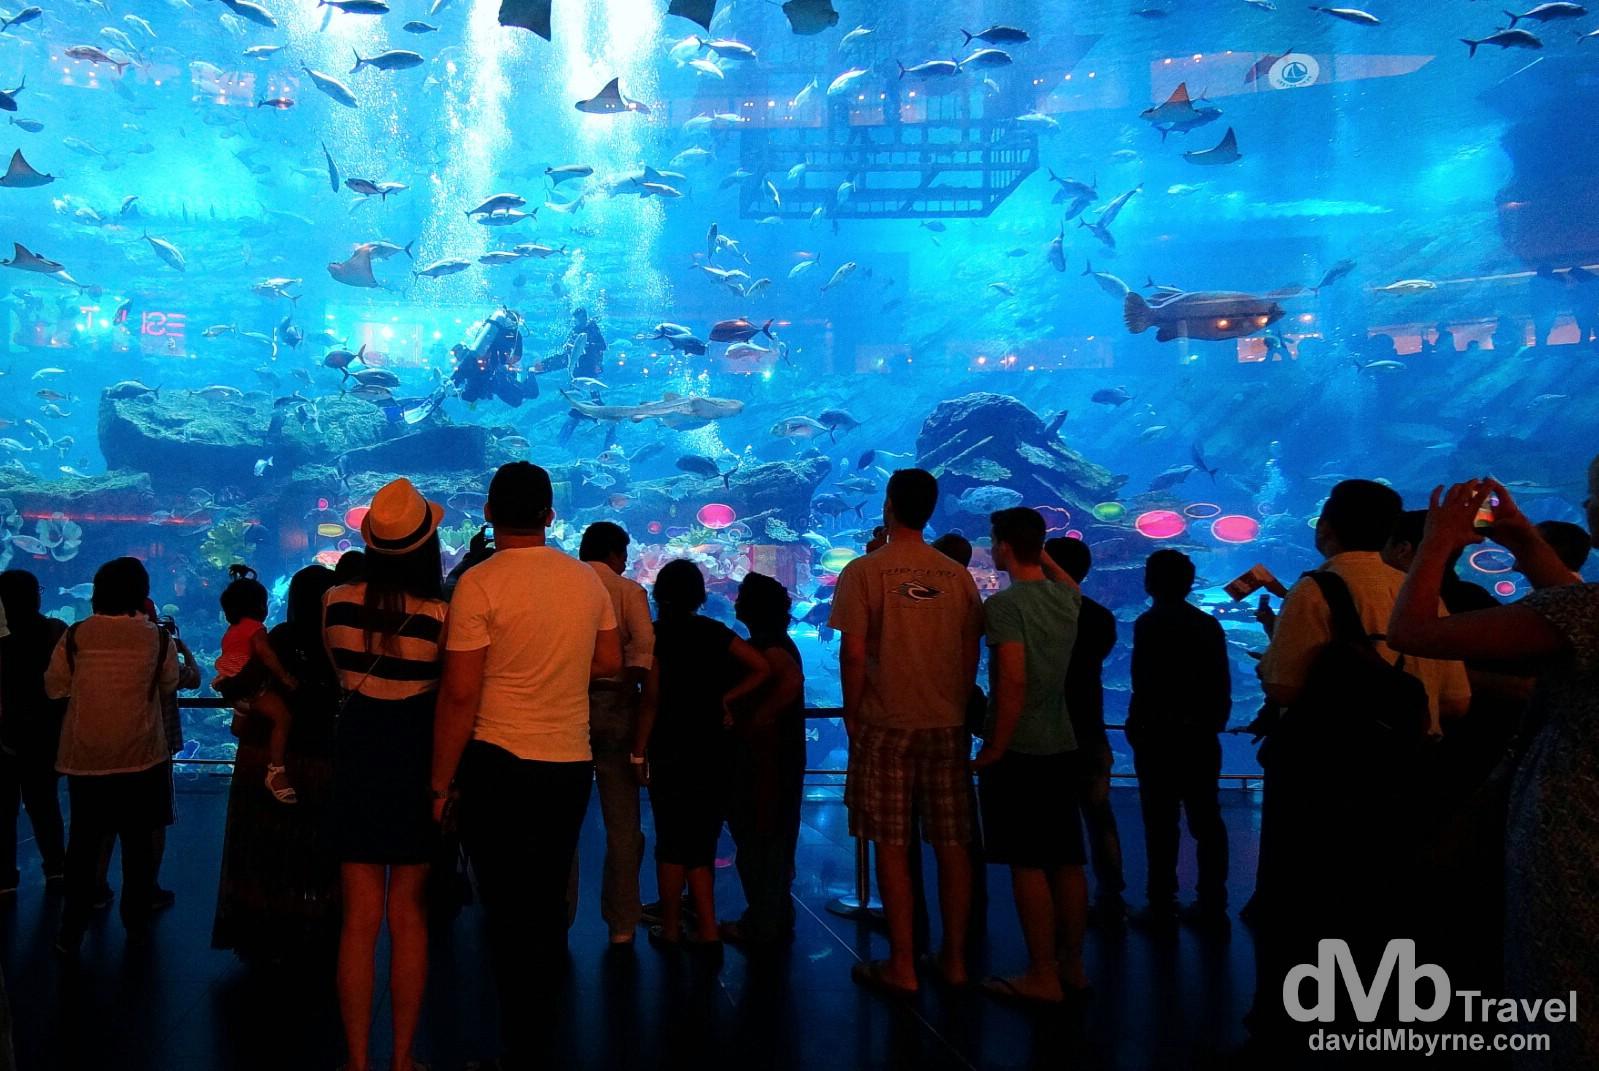 The viewing window of Dubai Aquarium in The Dubai Mall, Dubai, UAE. April 14th, 2014.